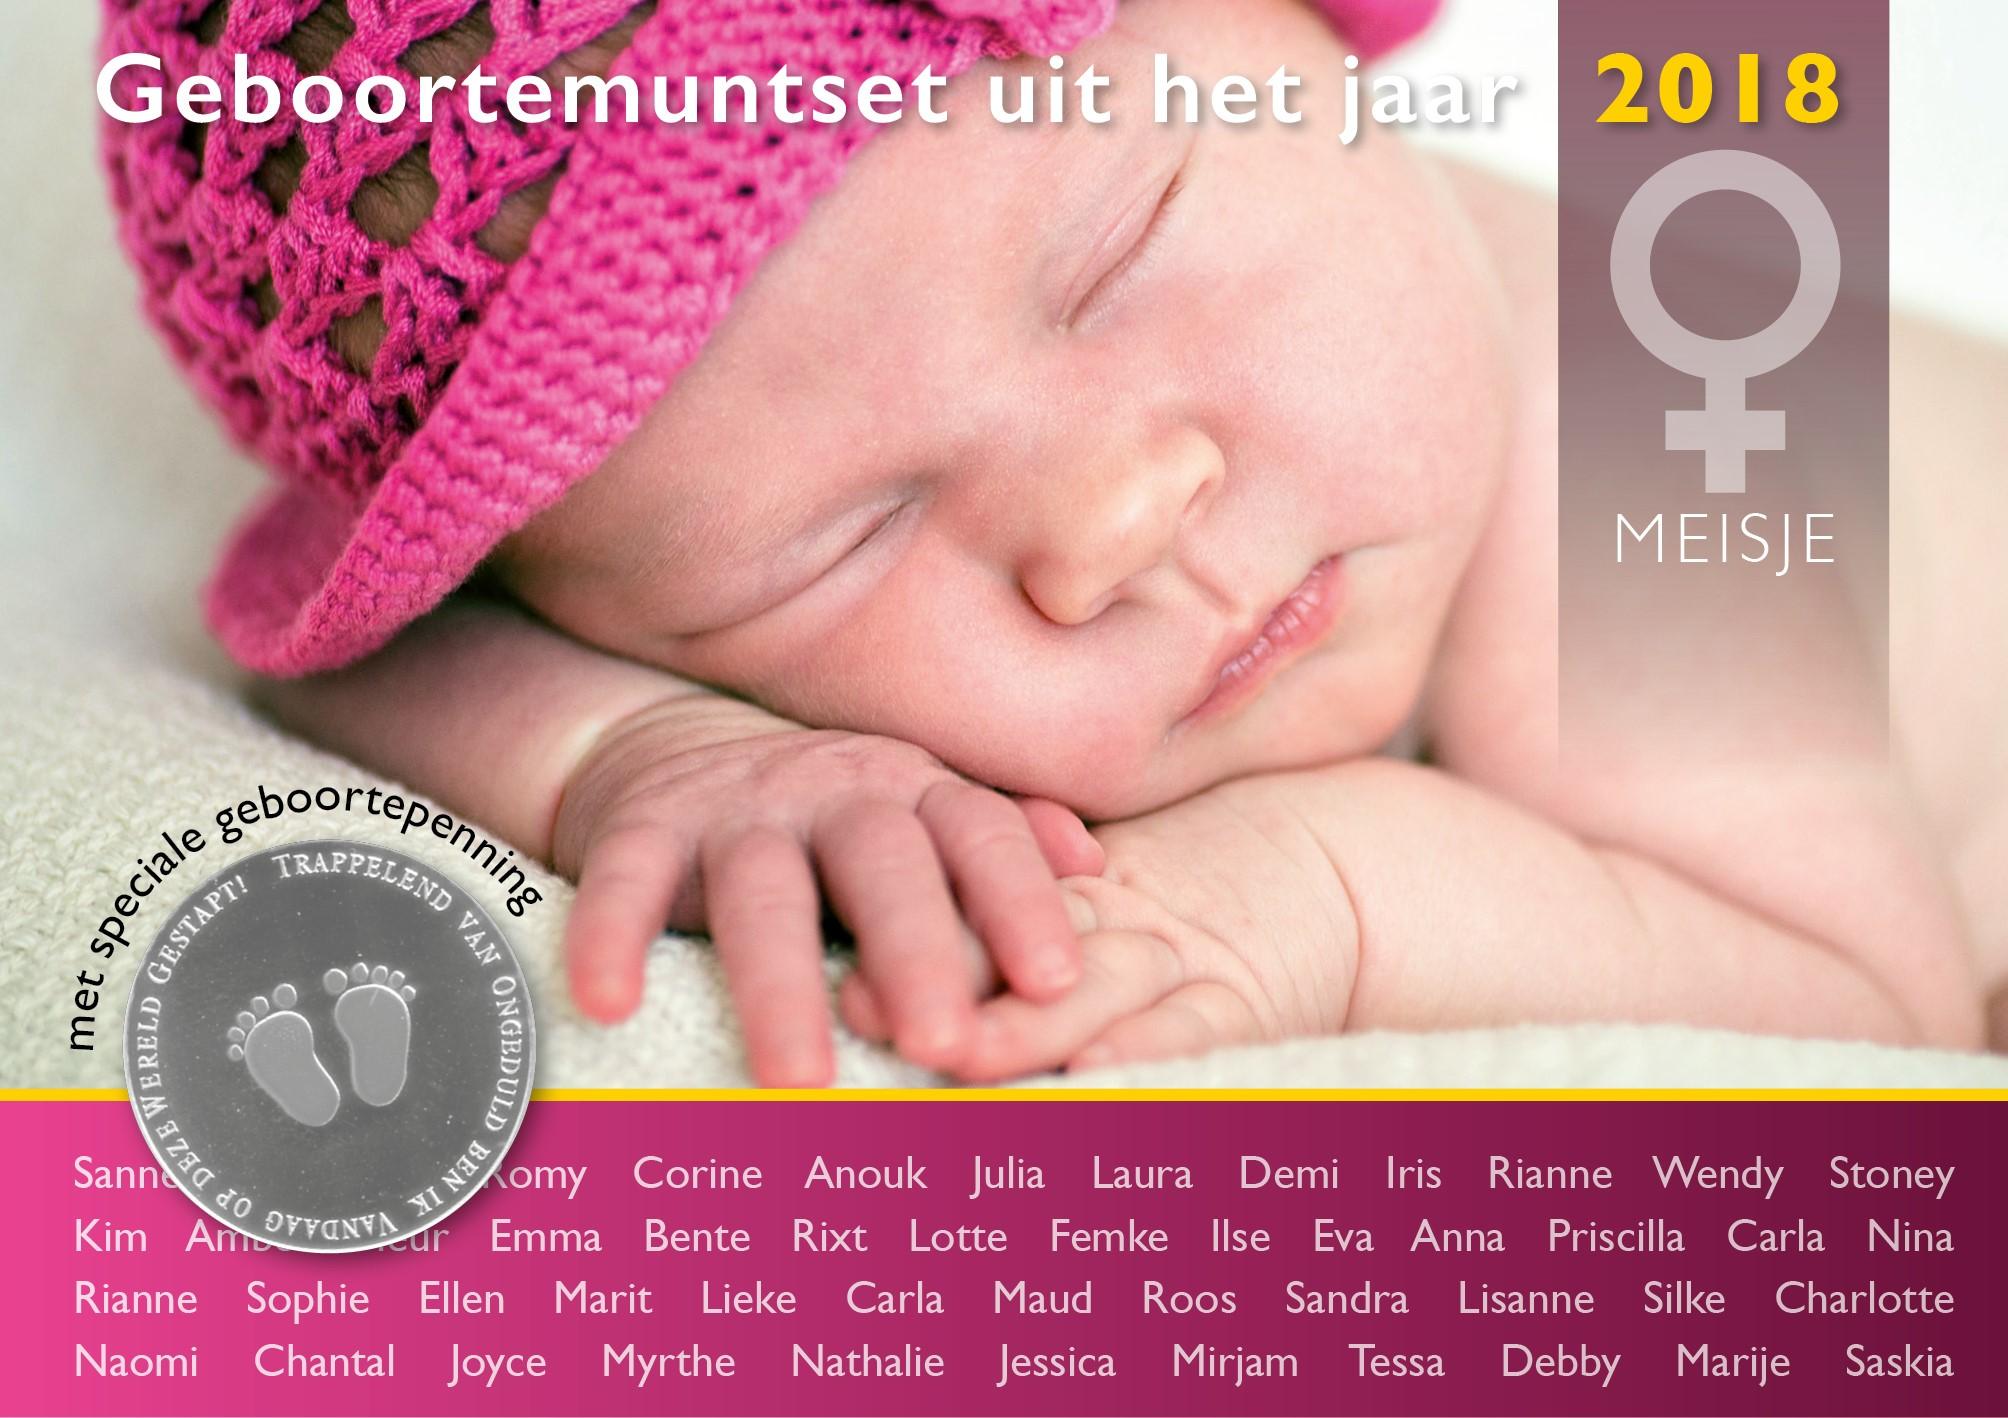 Geboorteset meisje 2018 theo peters numismatiek & filatelie b.v.